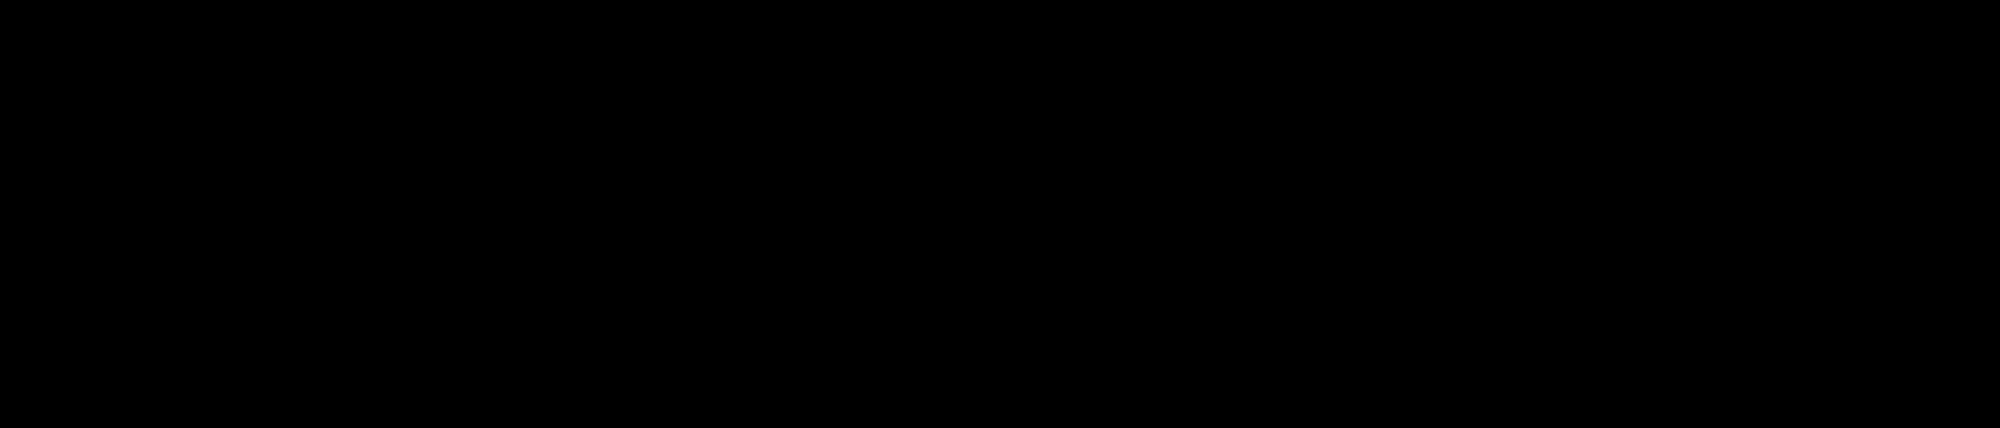 STILLNESS RETREAT-logo-black.png